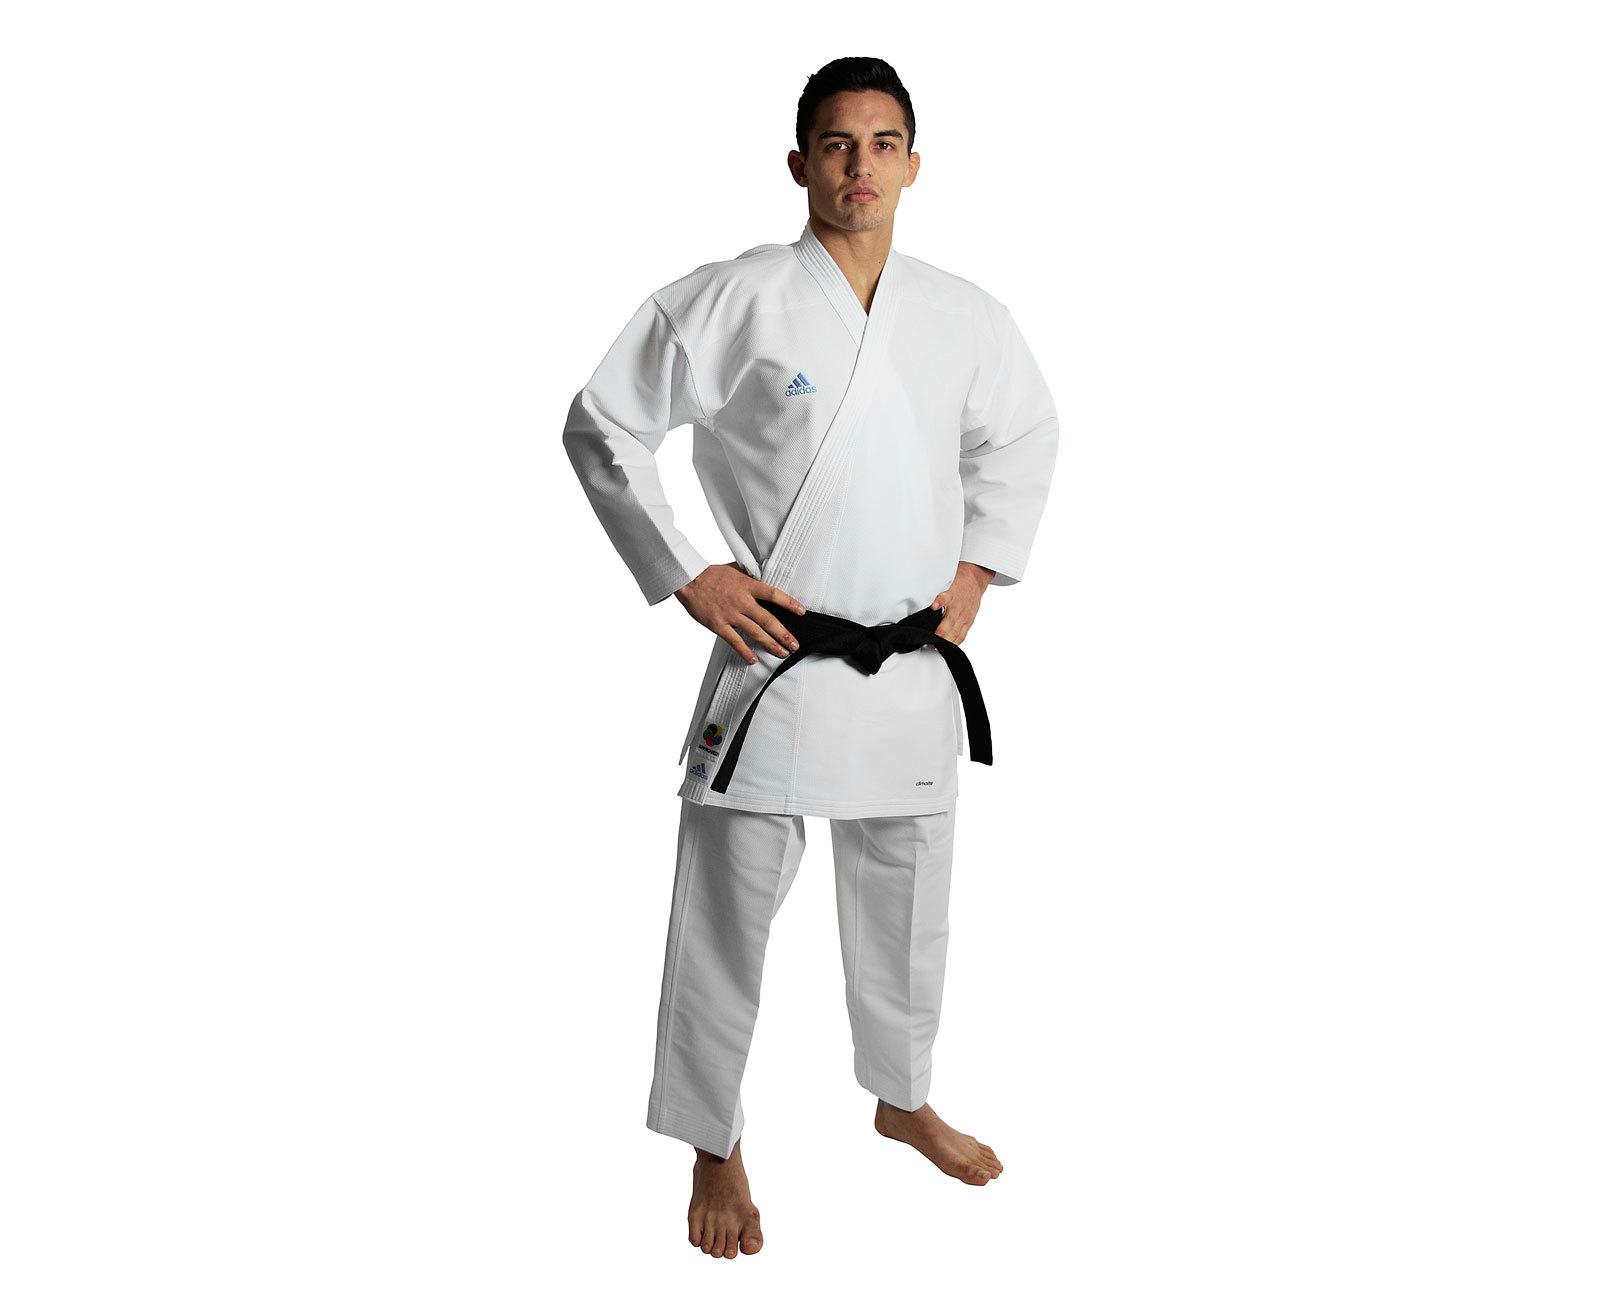 Кимоно КИМОНО ДЛЯ КАРАТЕ REVO FLEX KARATE GI WKF БЕЛОЕ kimono_dlya_karate_revo_flex_karate_gi_wkf_beloe.jpg